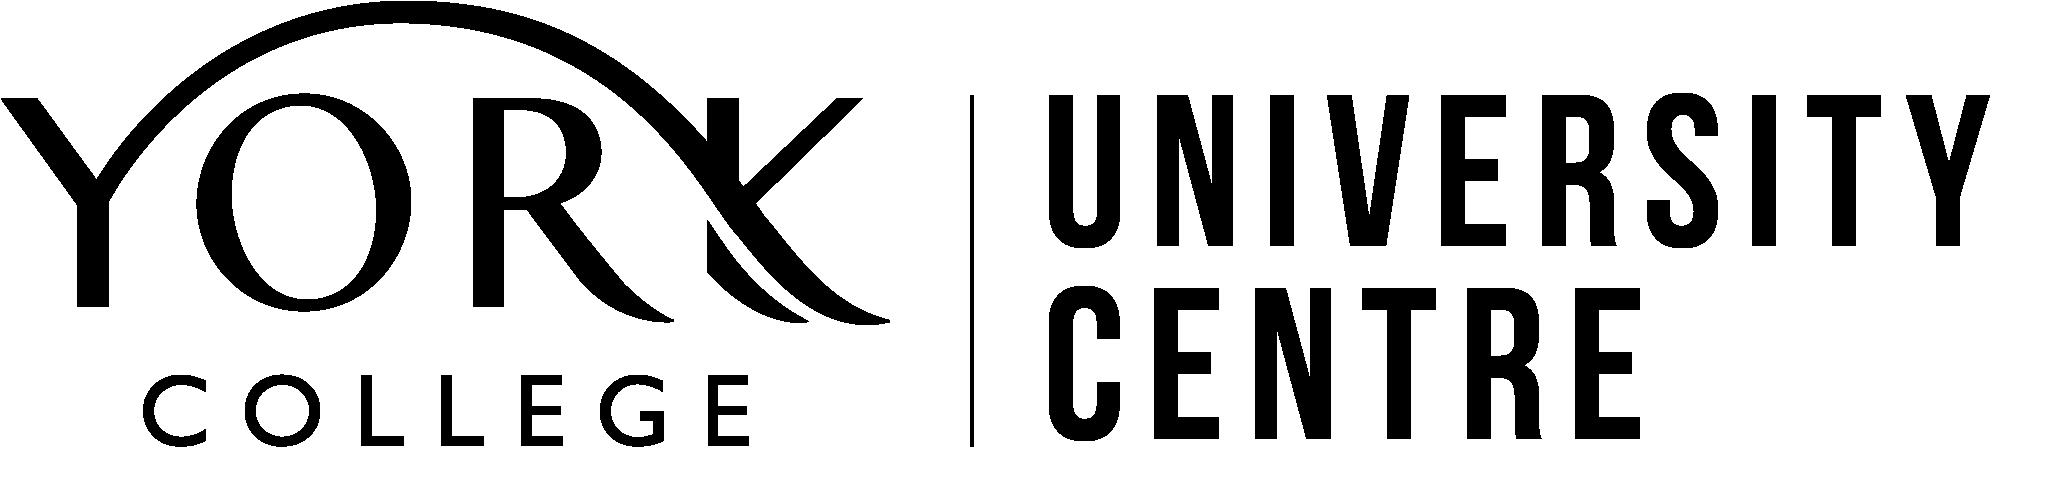 York College University Centre Logo Black